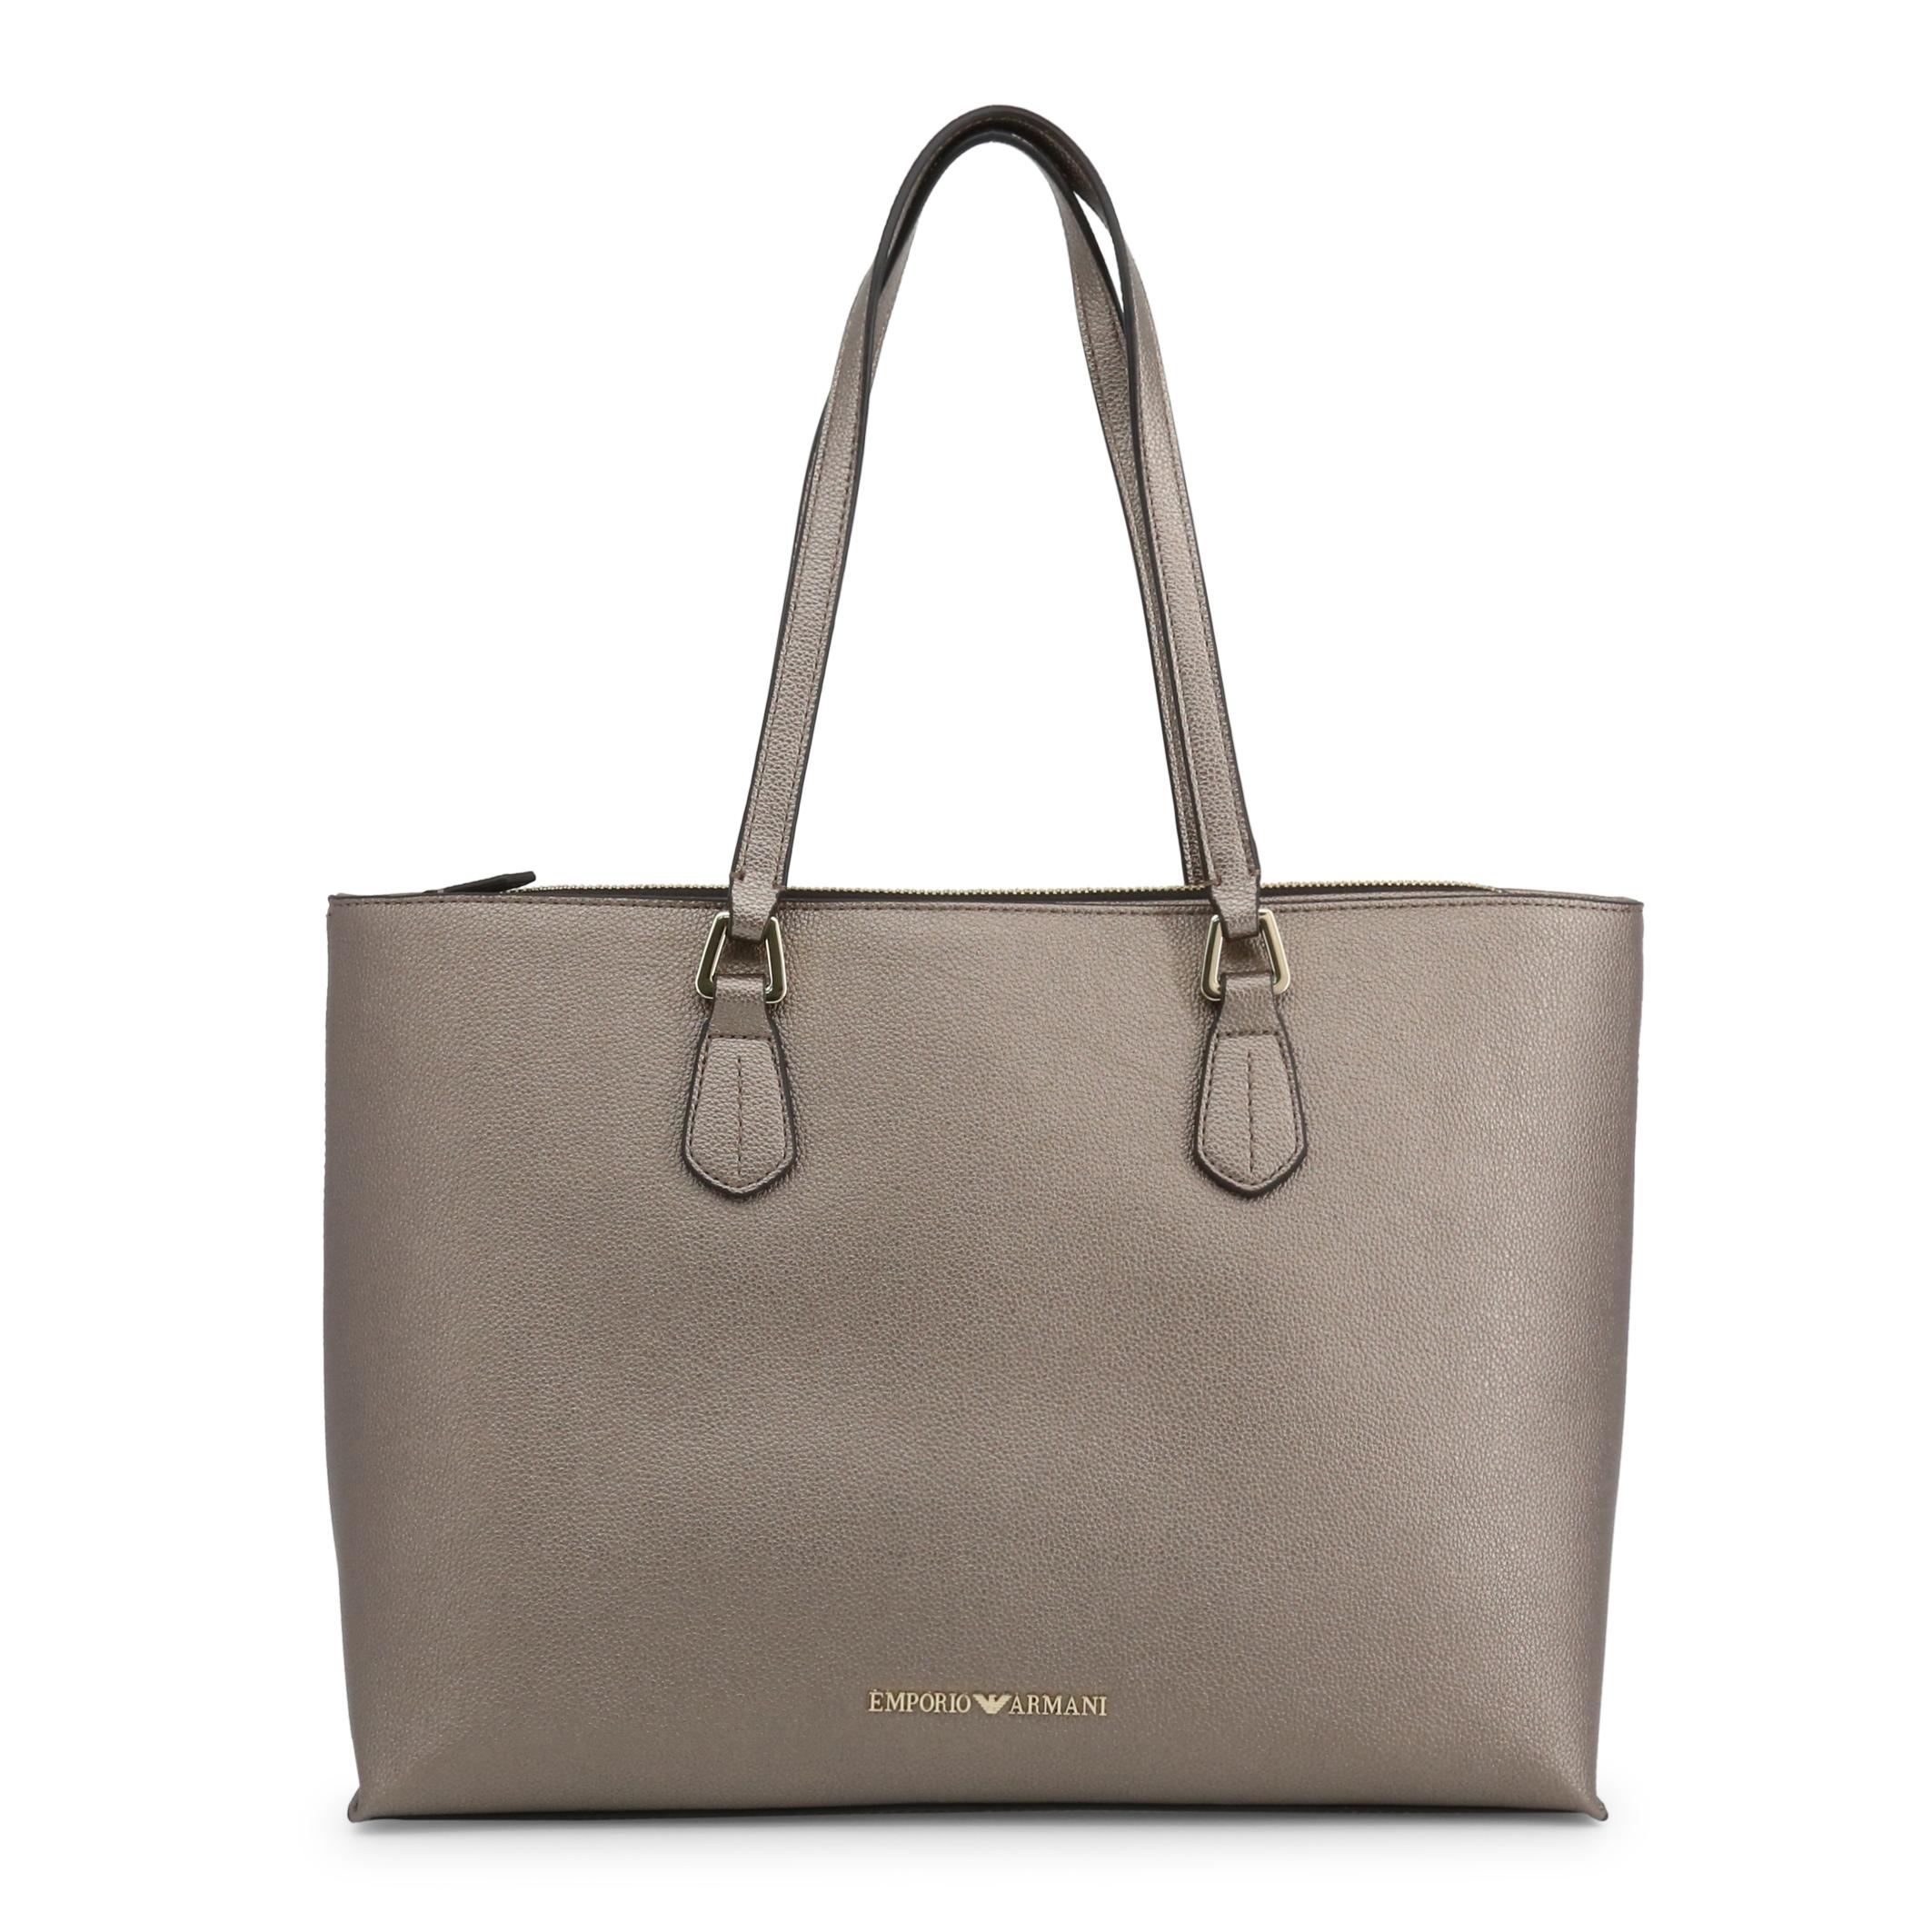 Cabas / Sacs shopping  Emporio armani Y3D118_YH65A brown